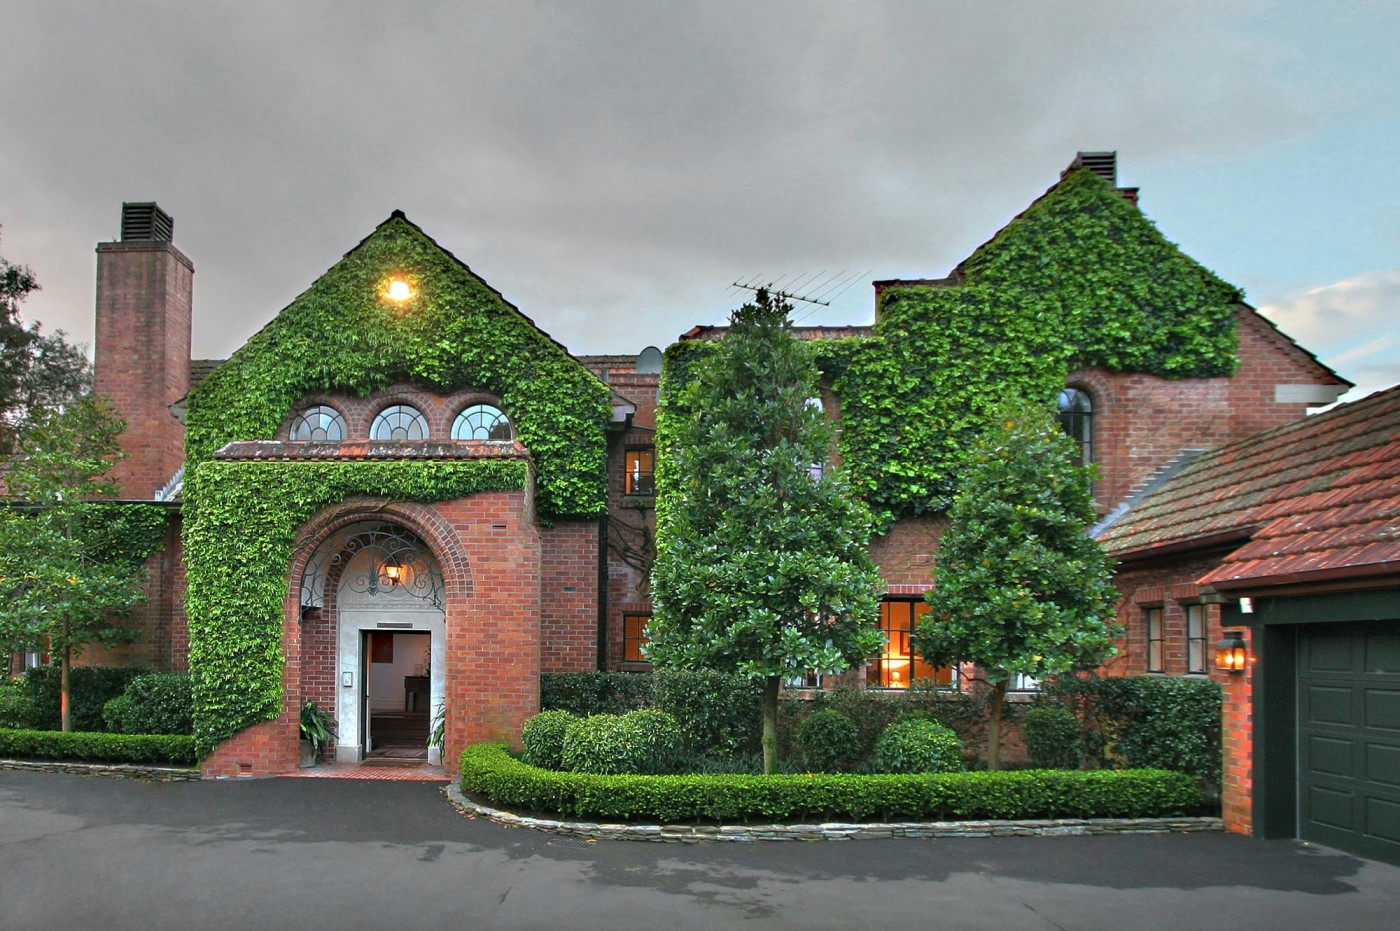 Godden Crescent House Sumich Chaplin Architects